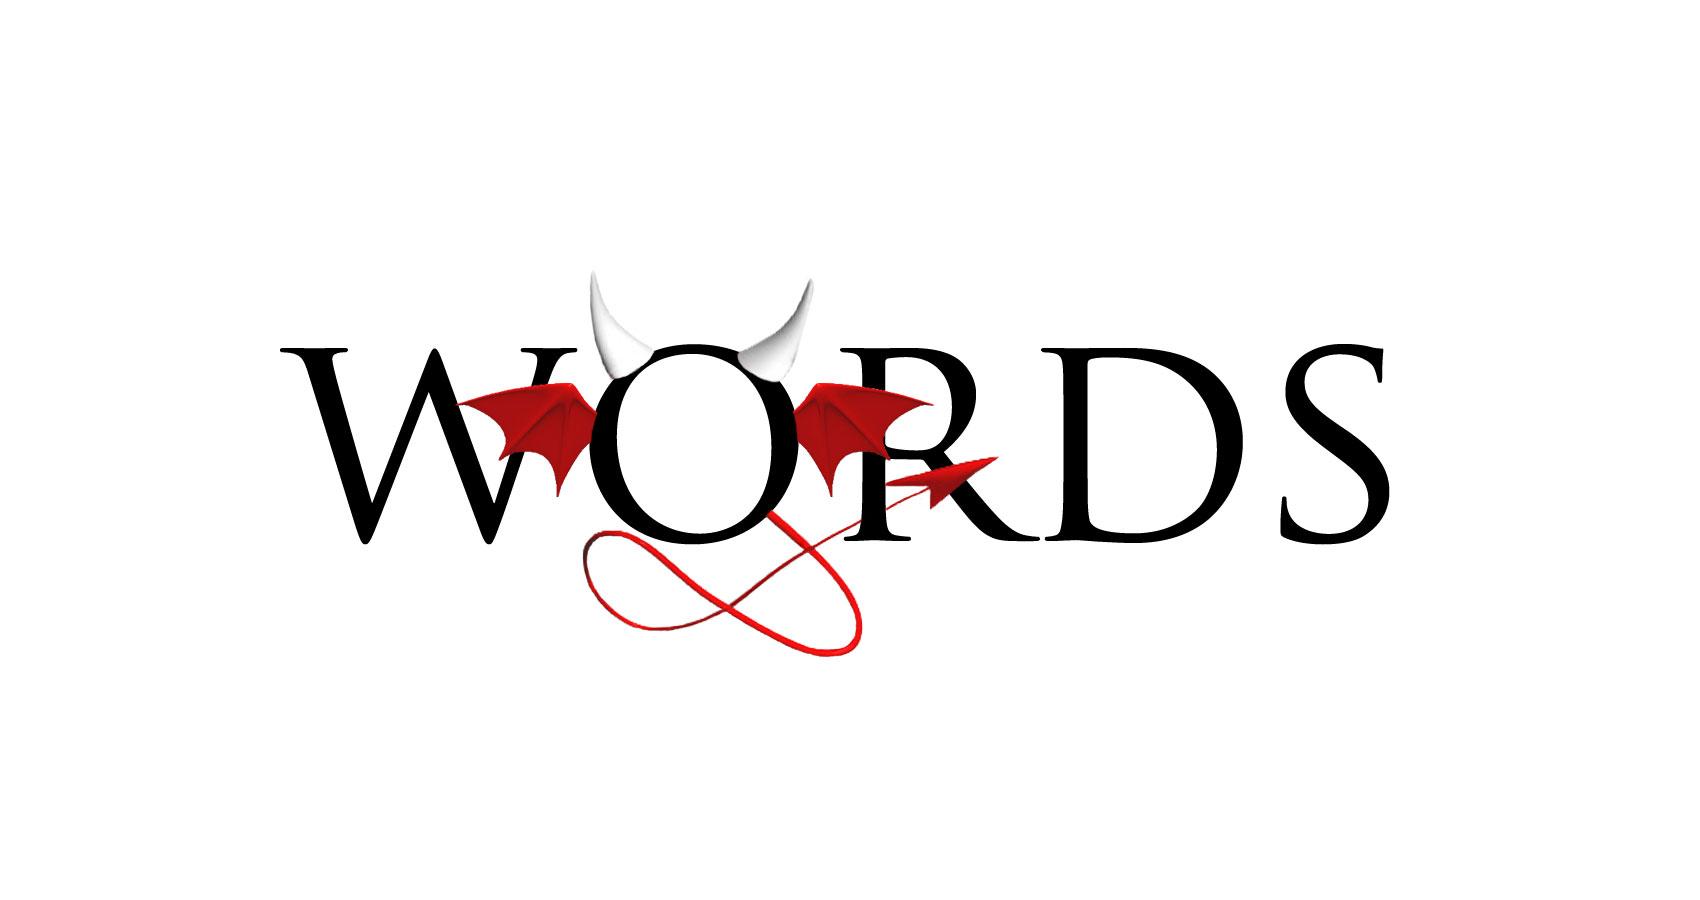 Uninhibited poem by J. AnnRey at Spillwords.com